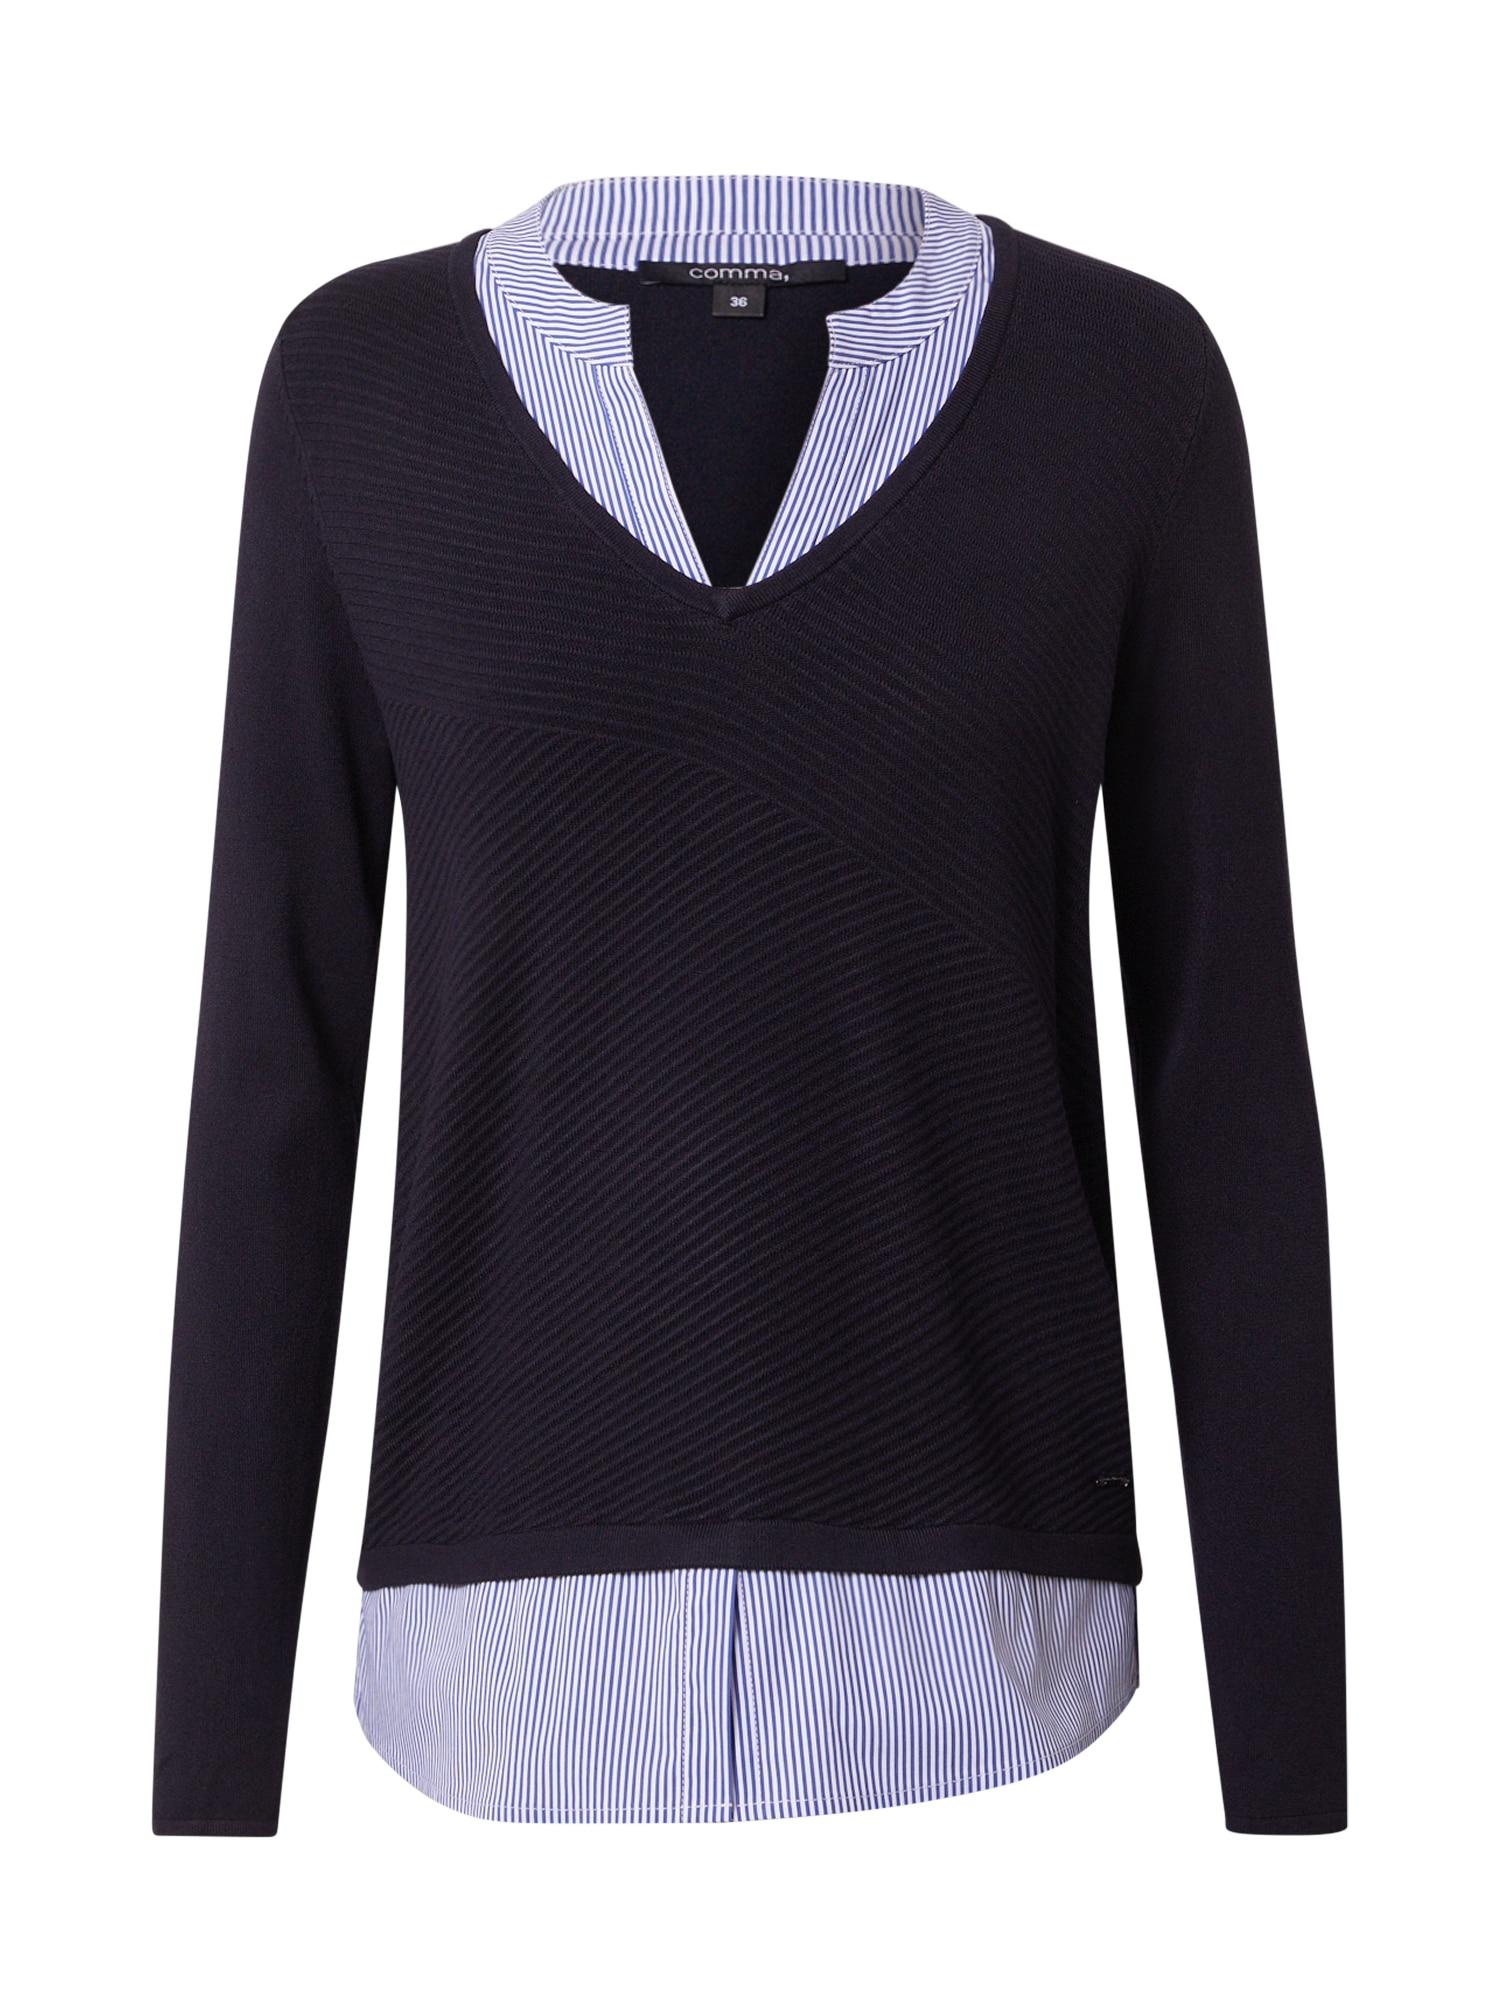 COMMA Megztinis mišrios spalvos